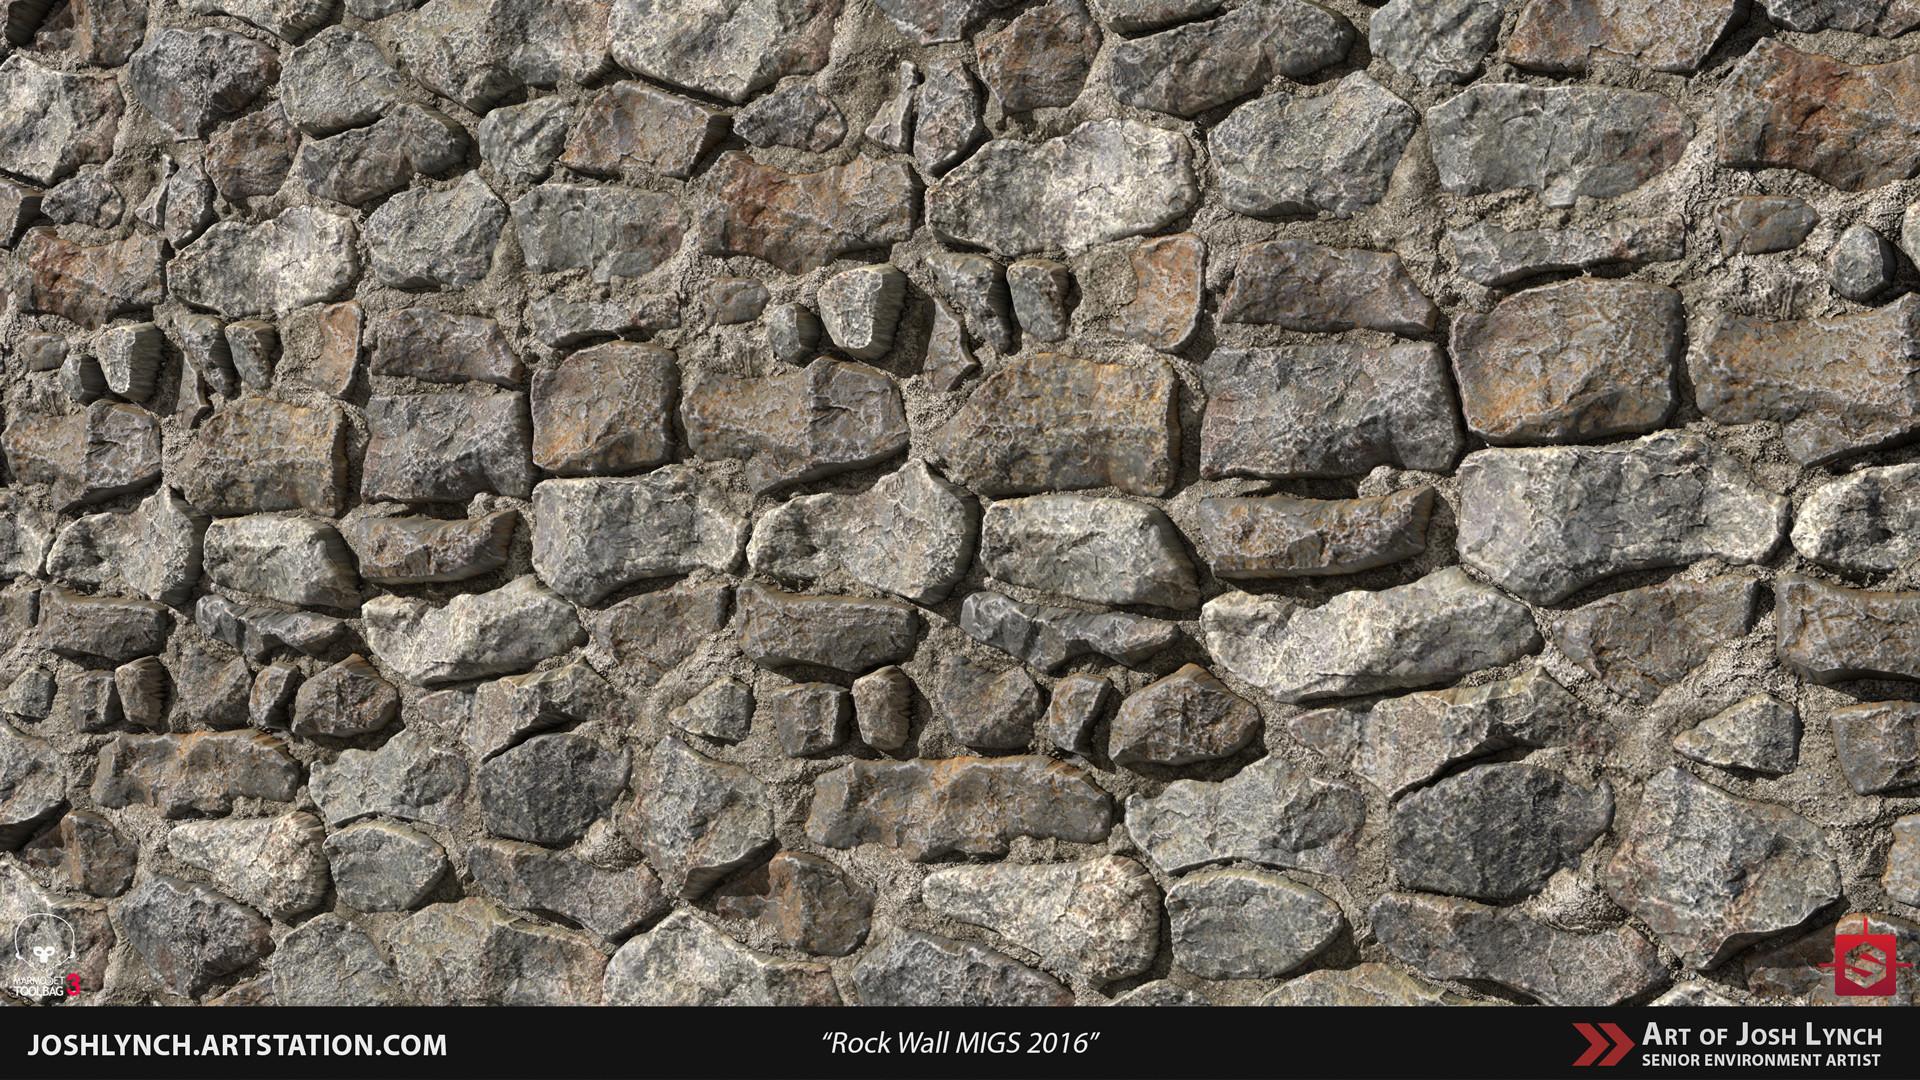 Joshua lynch migs stone wall 02 wall layout comp